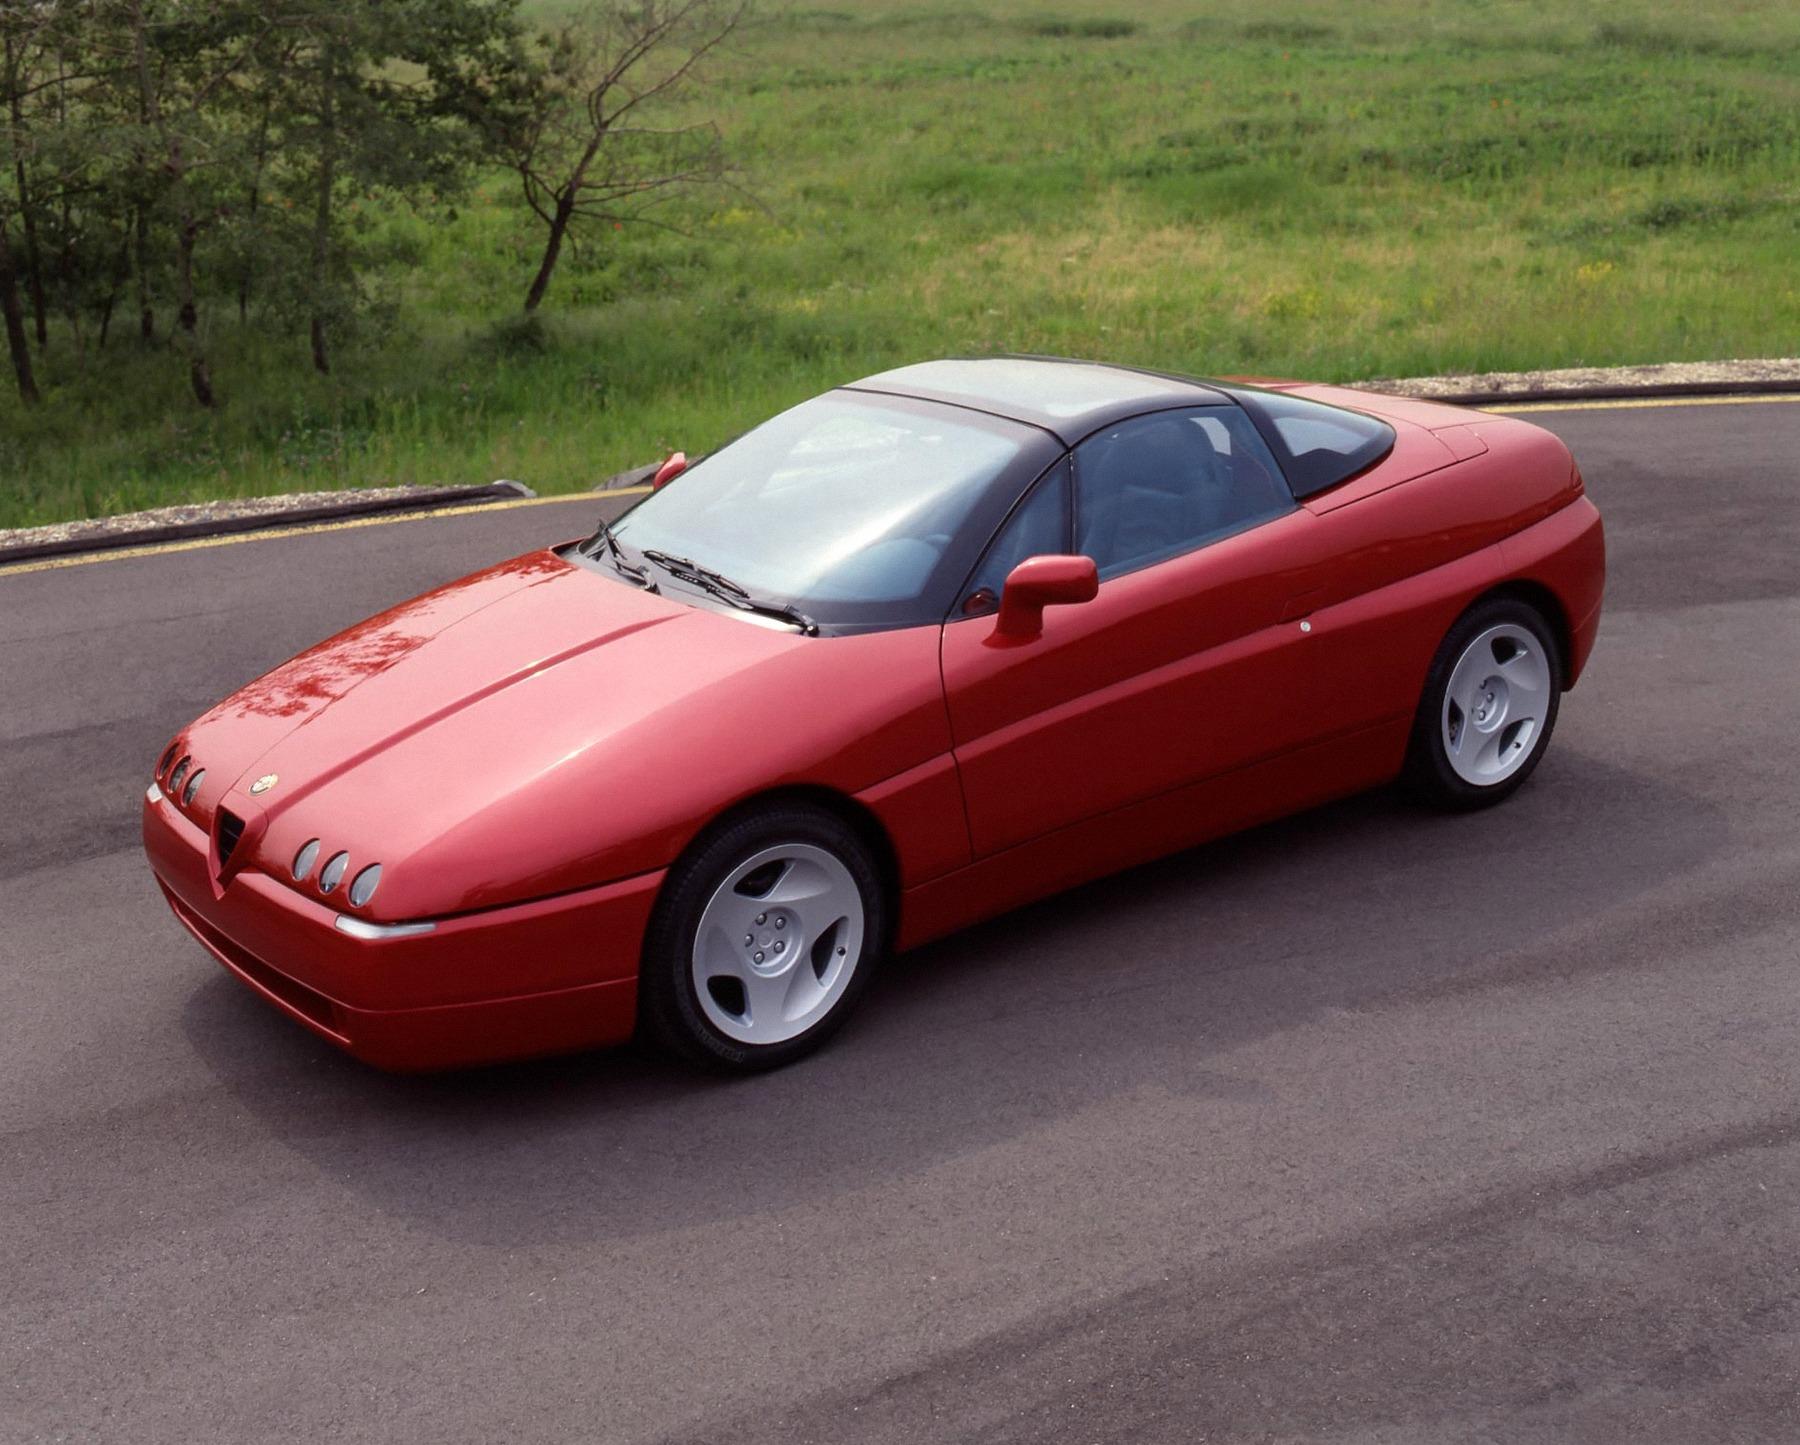 1991-Alfa-Romeo-164-Proteo-04